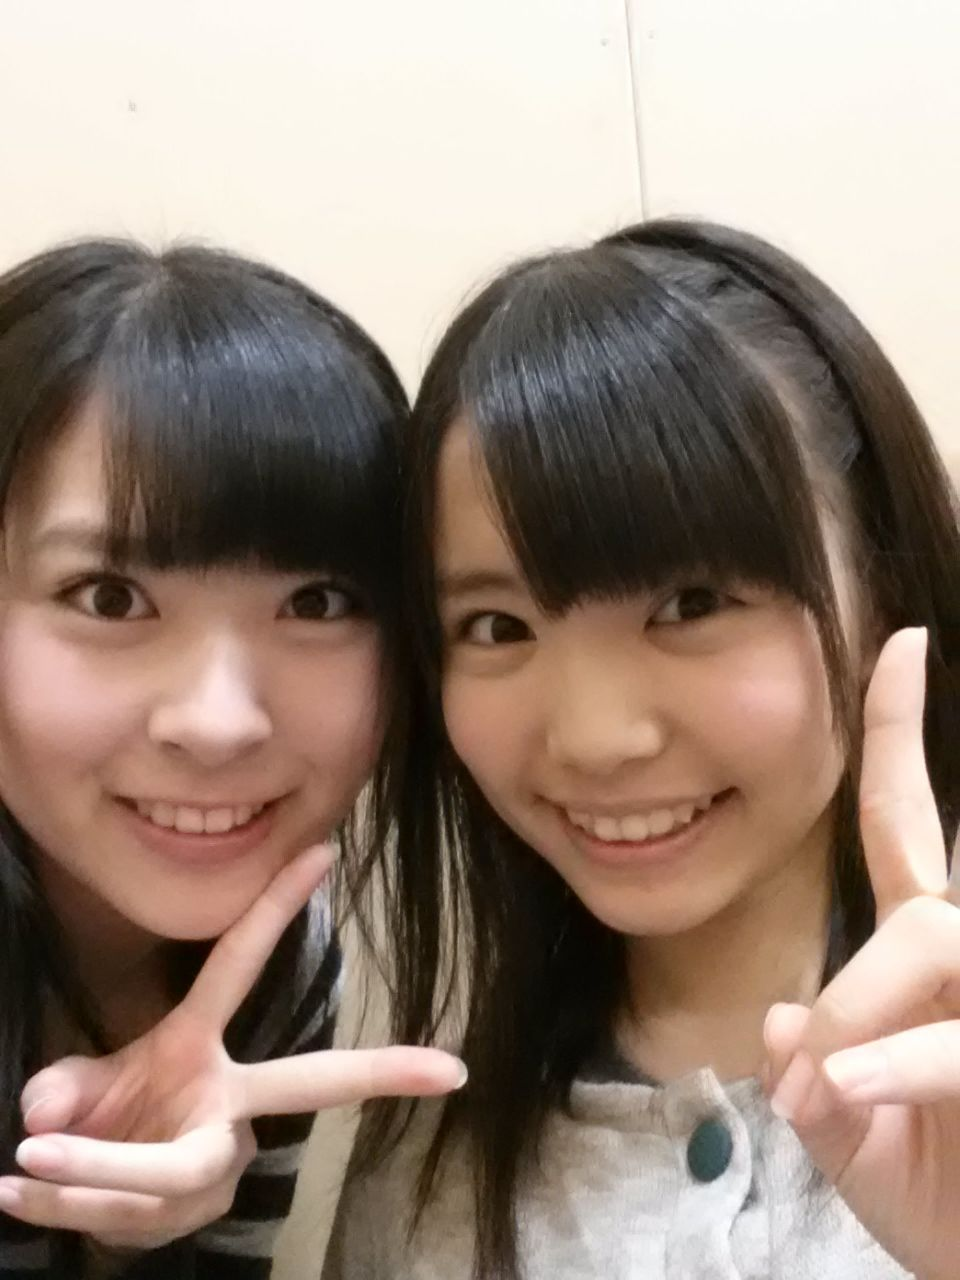 http://livedoor.blogimg.jp/otohaeika/imgs/b/4/b4d24bb8.jpg